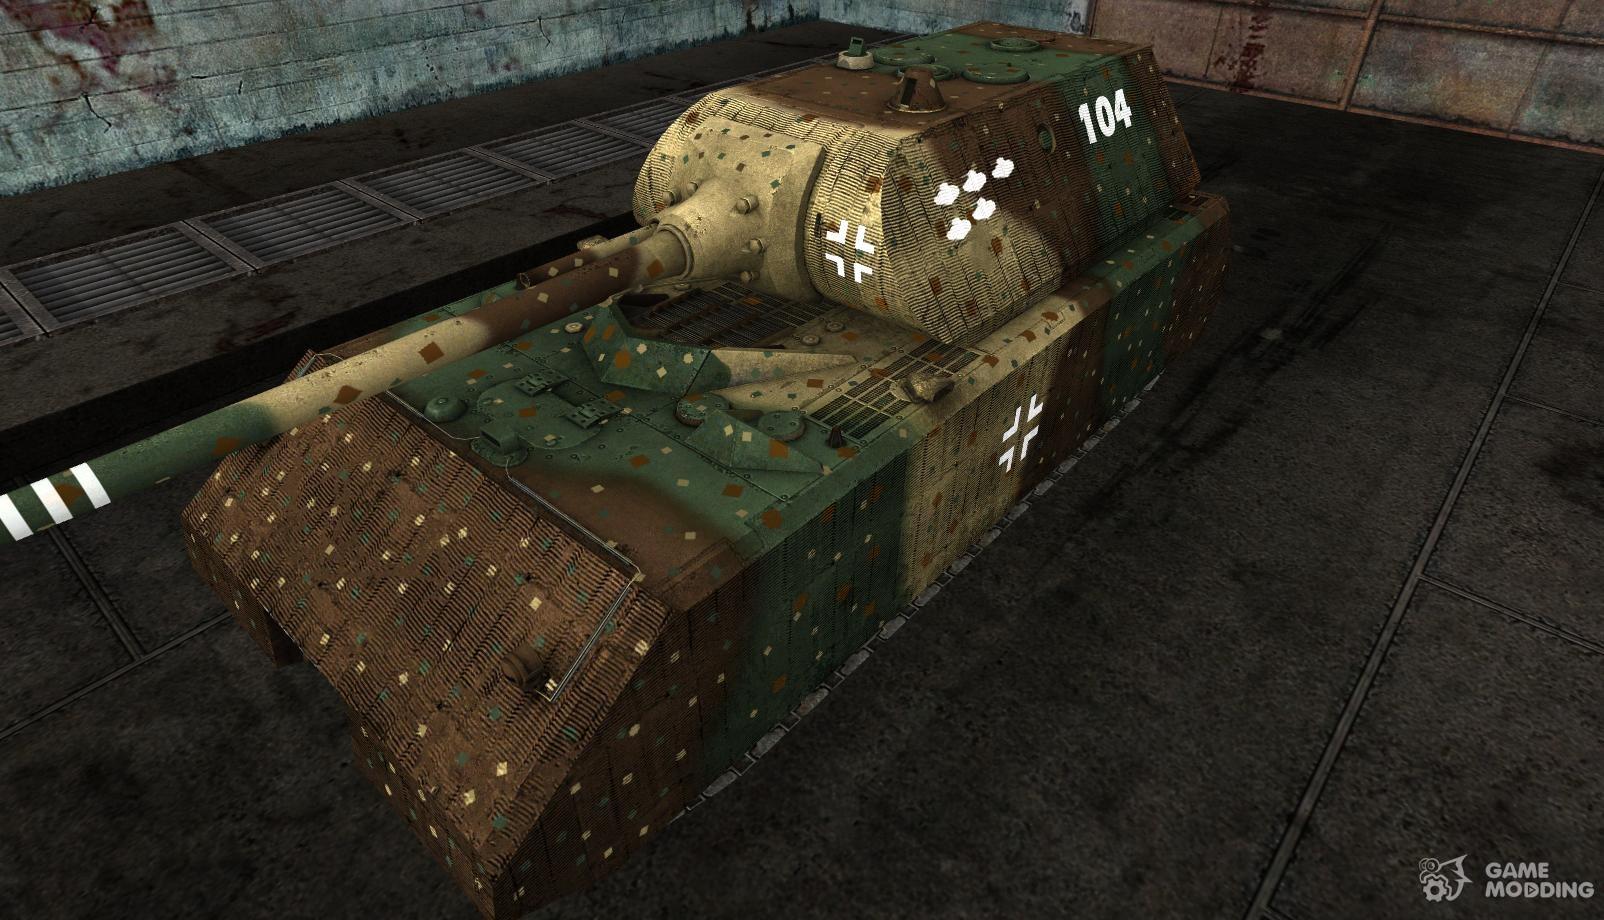 world of tanks crosshairs mod